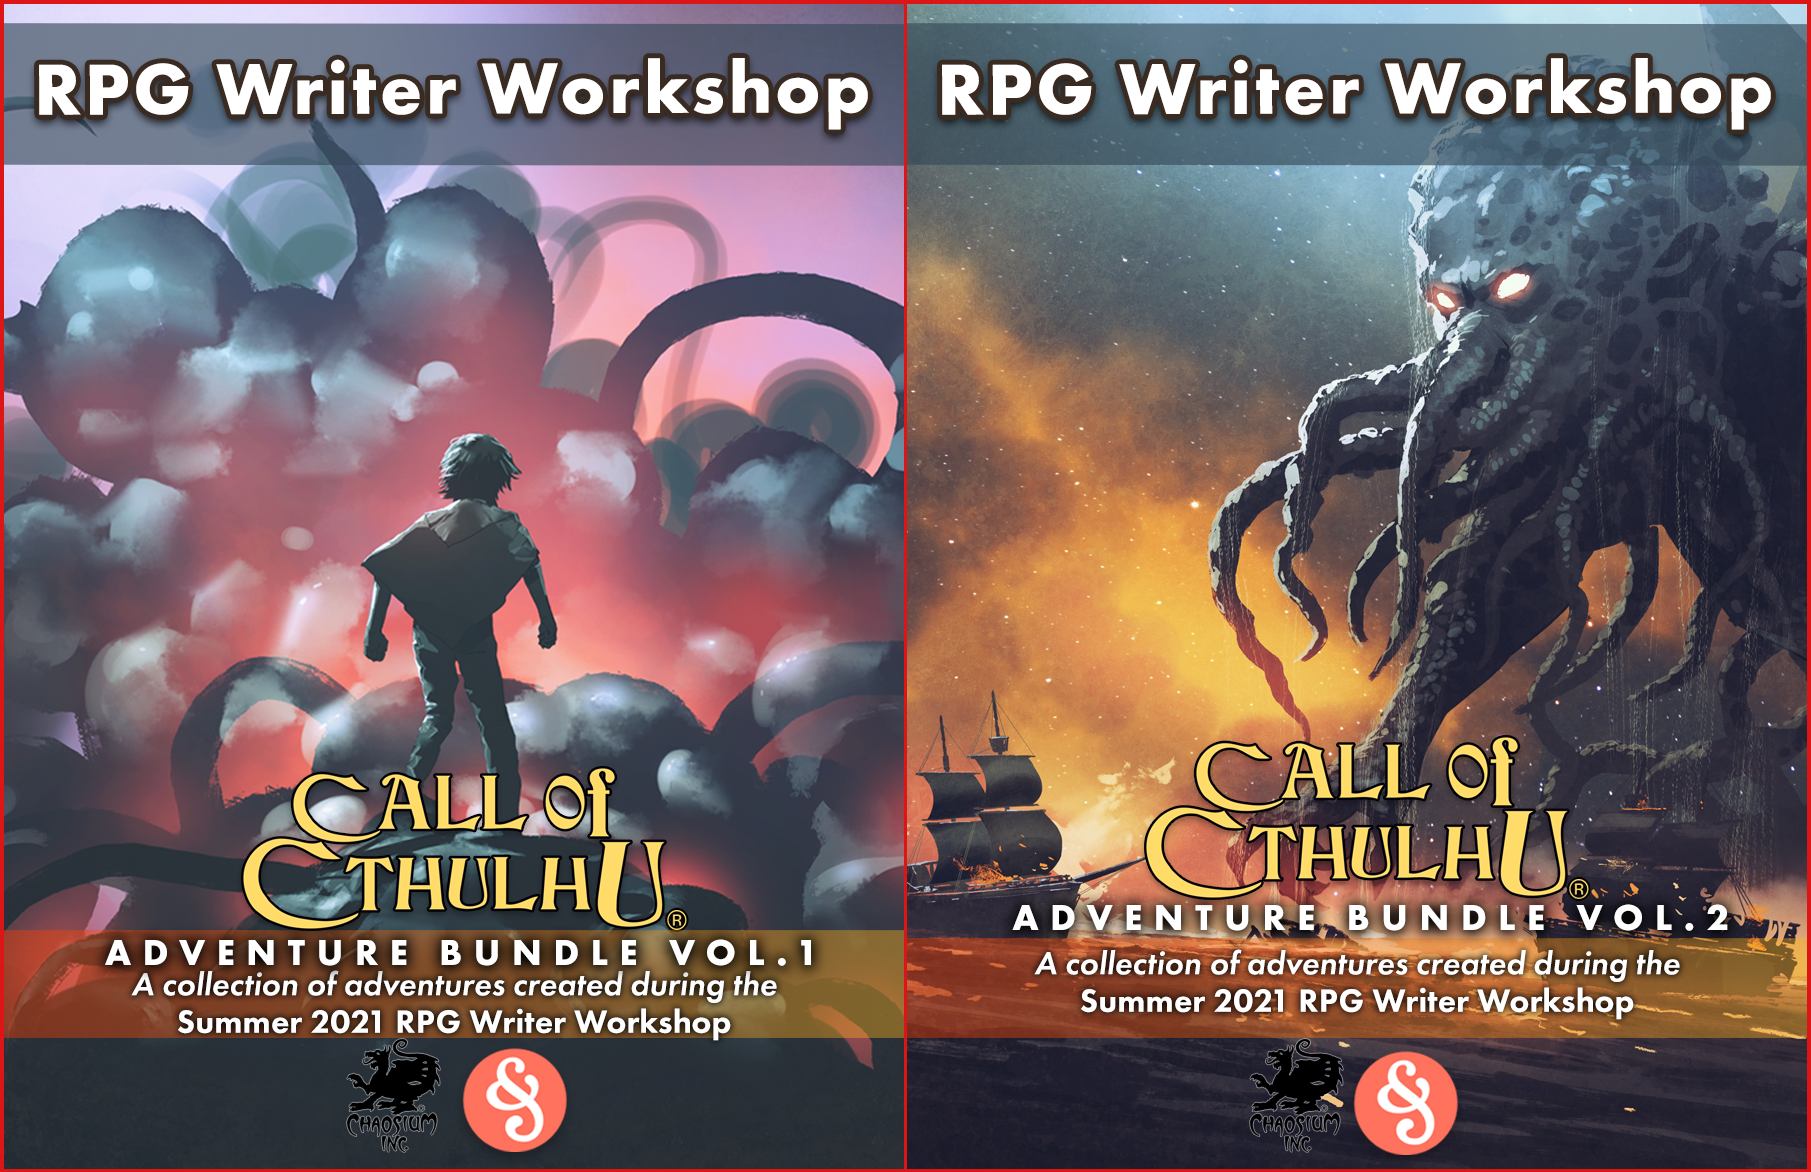 rpg-writer-workshop-bundles.png